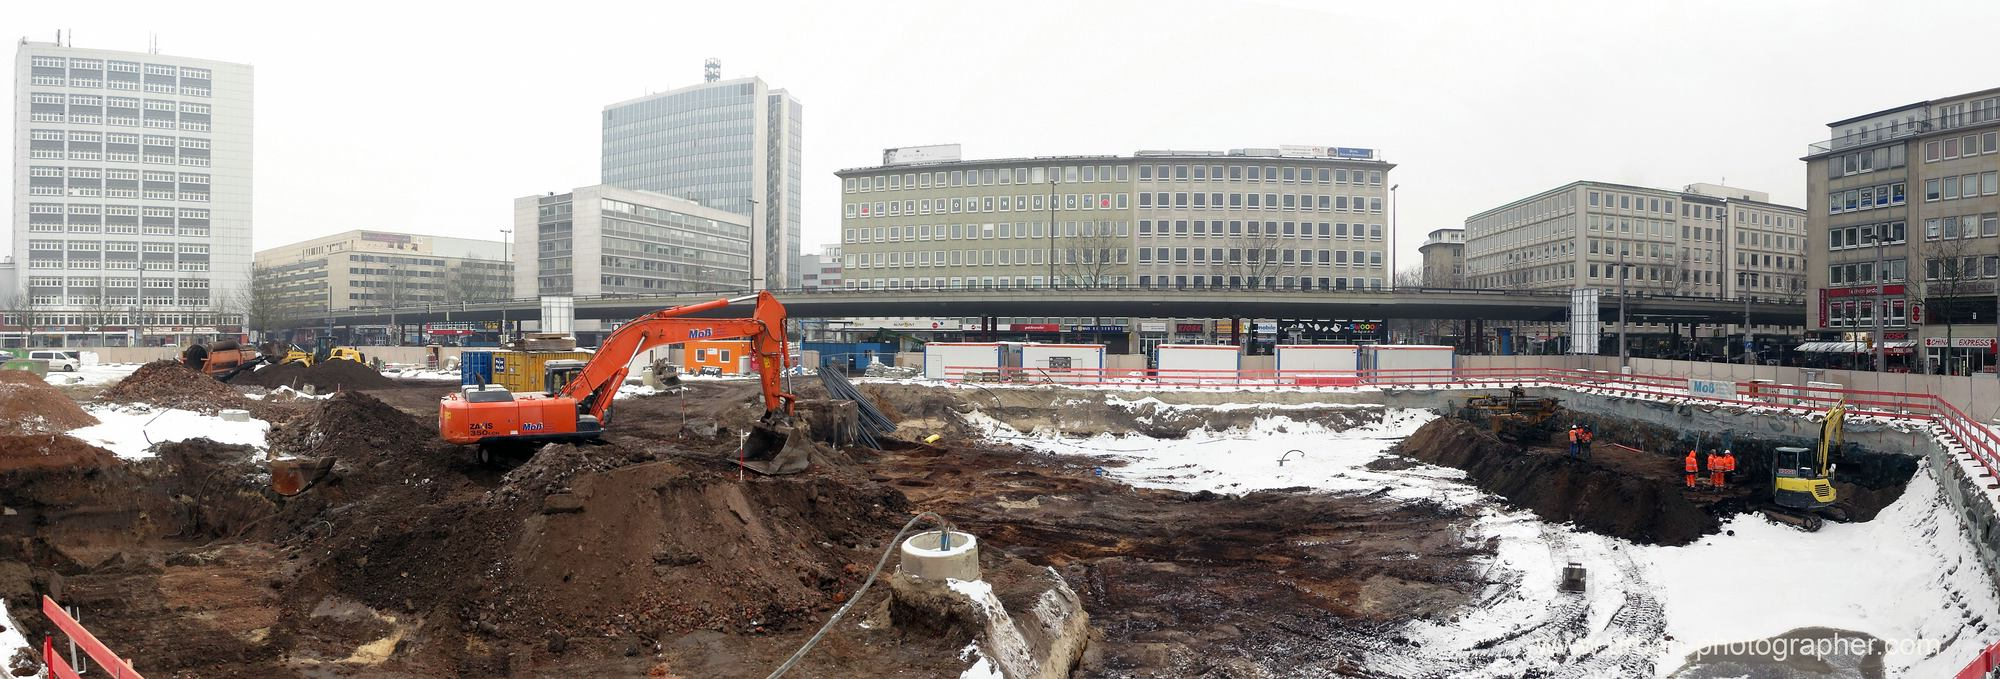 Baustelle Bahnhofsplatz 18